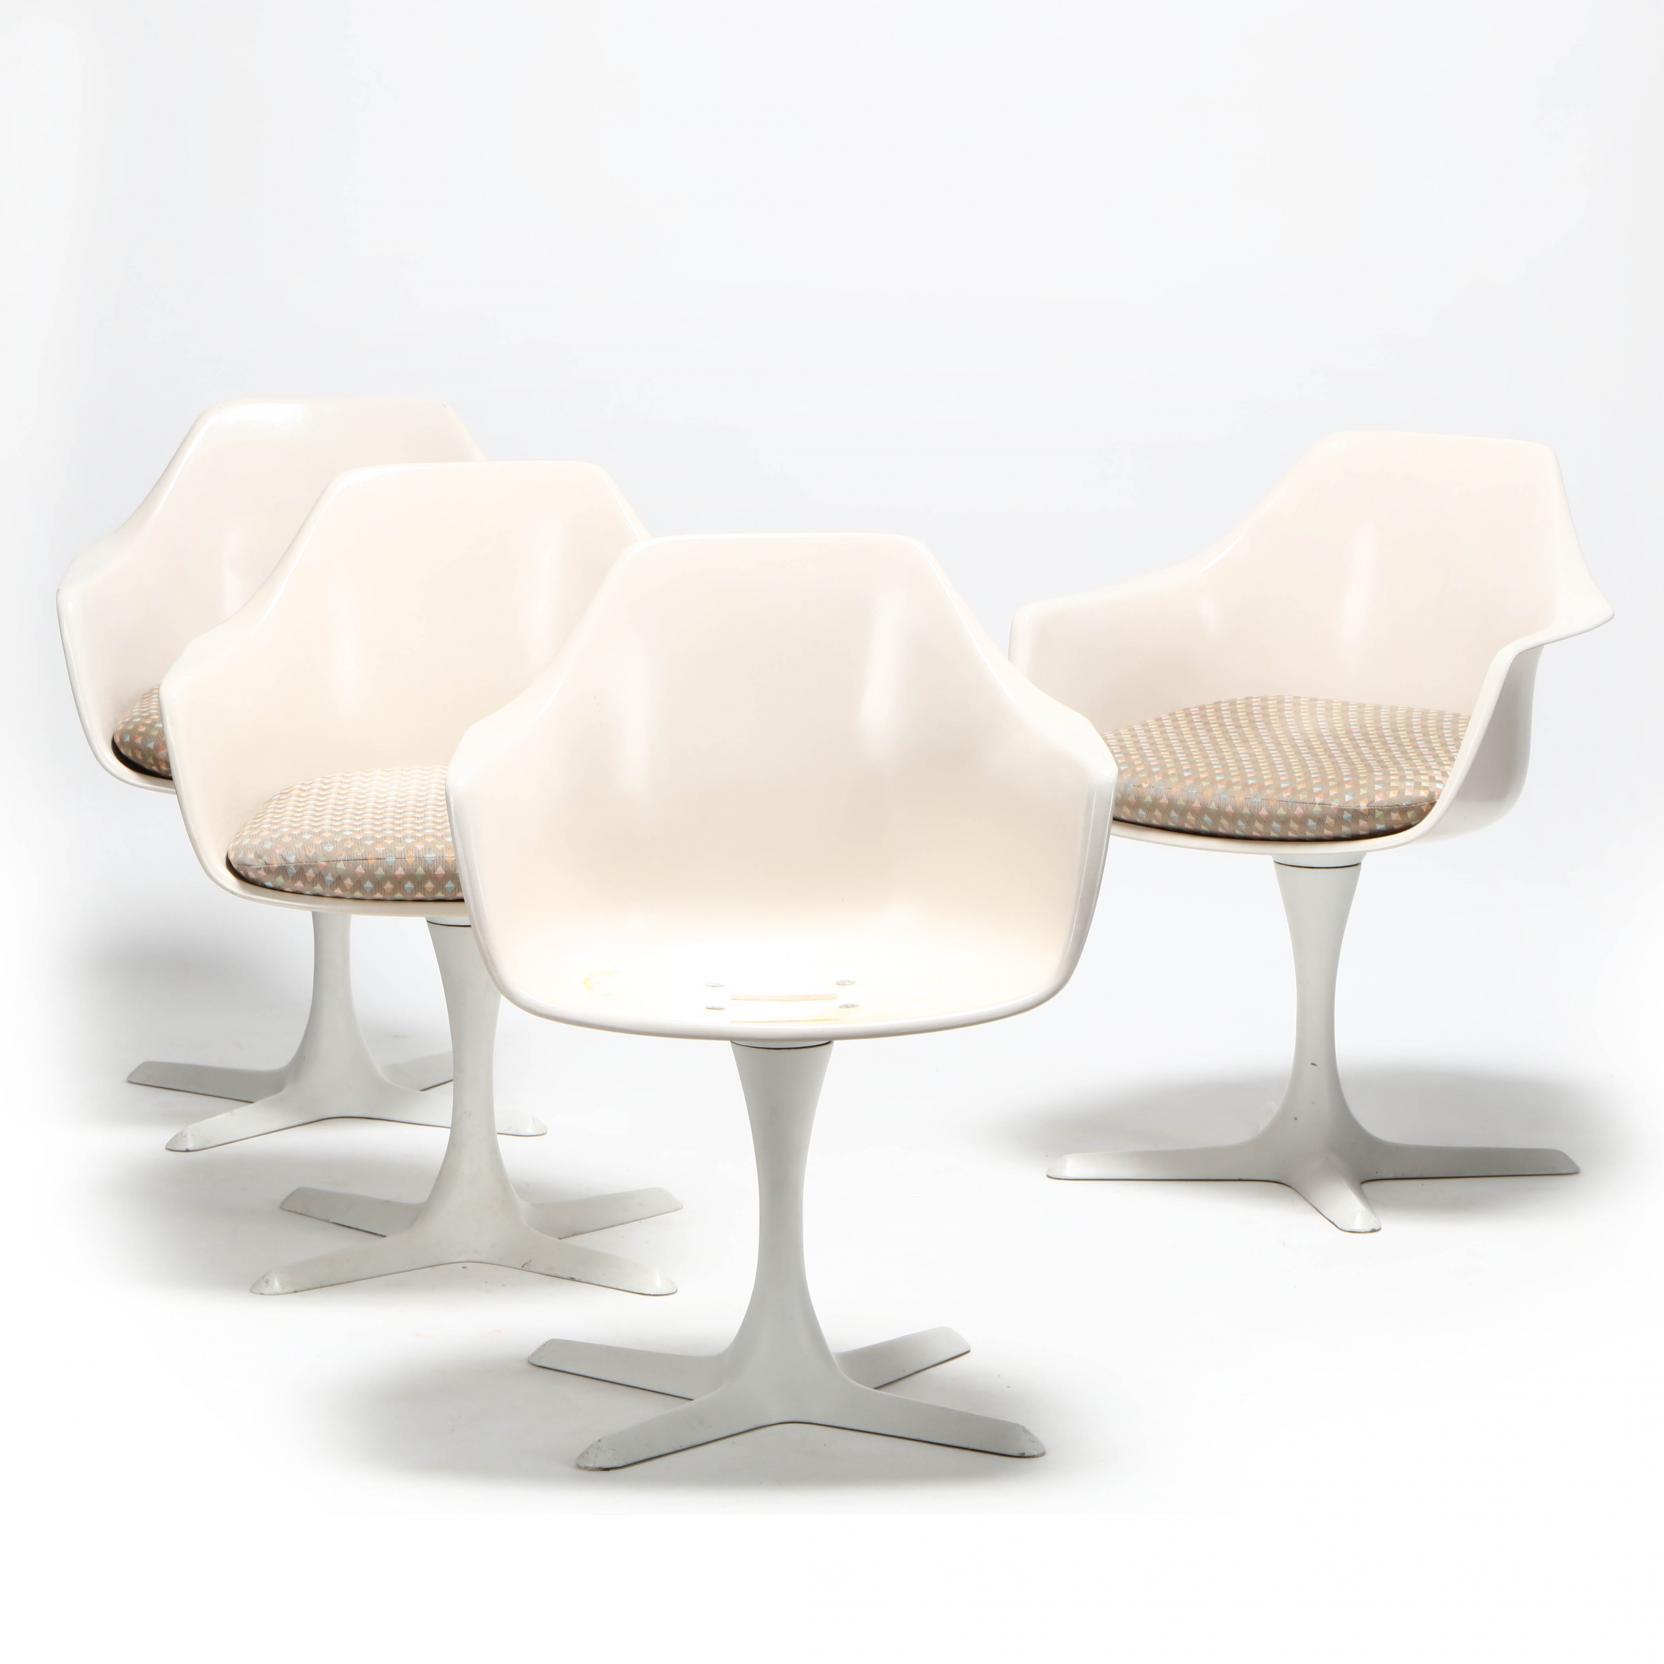 burke-inc-set-of-four-tulip-swivel-chairs